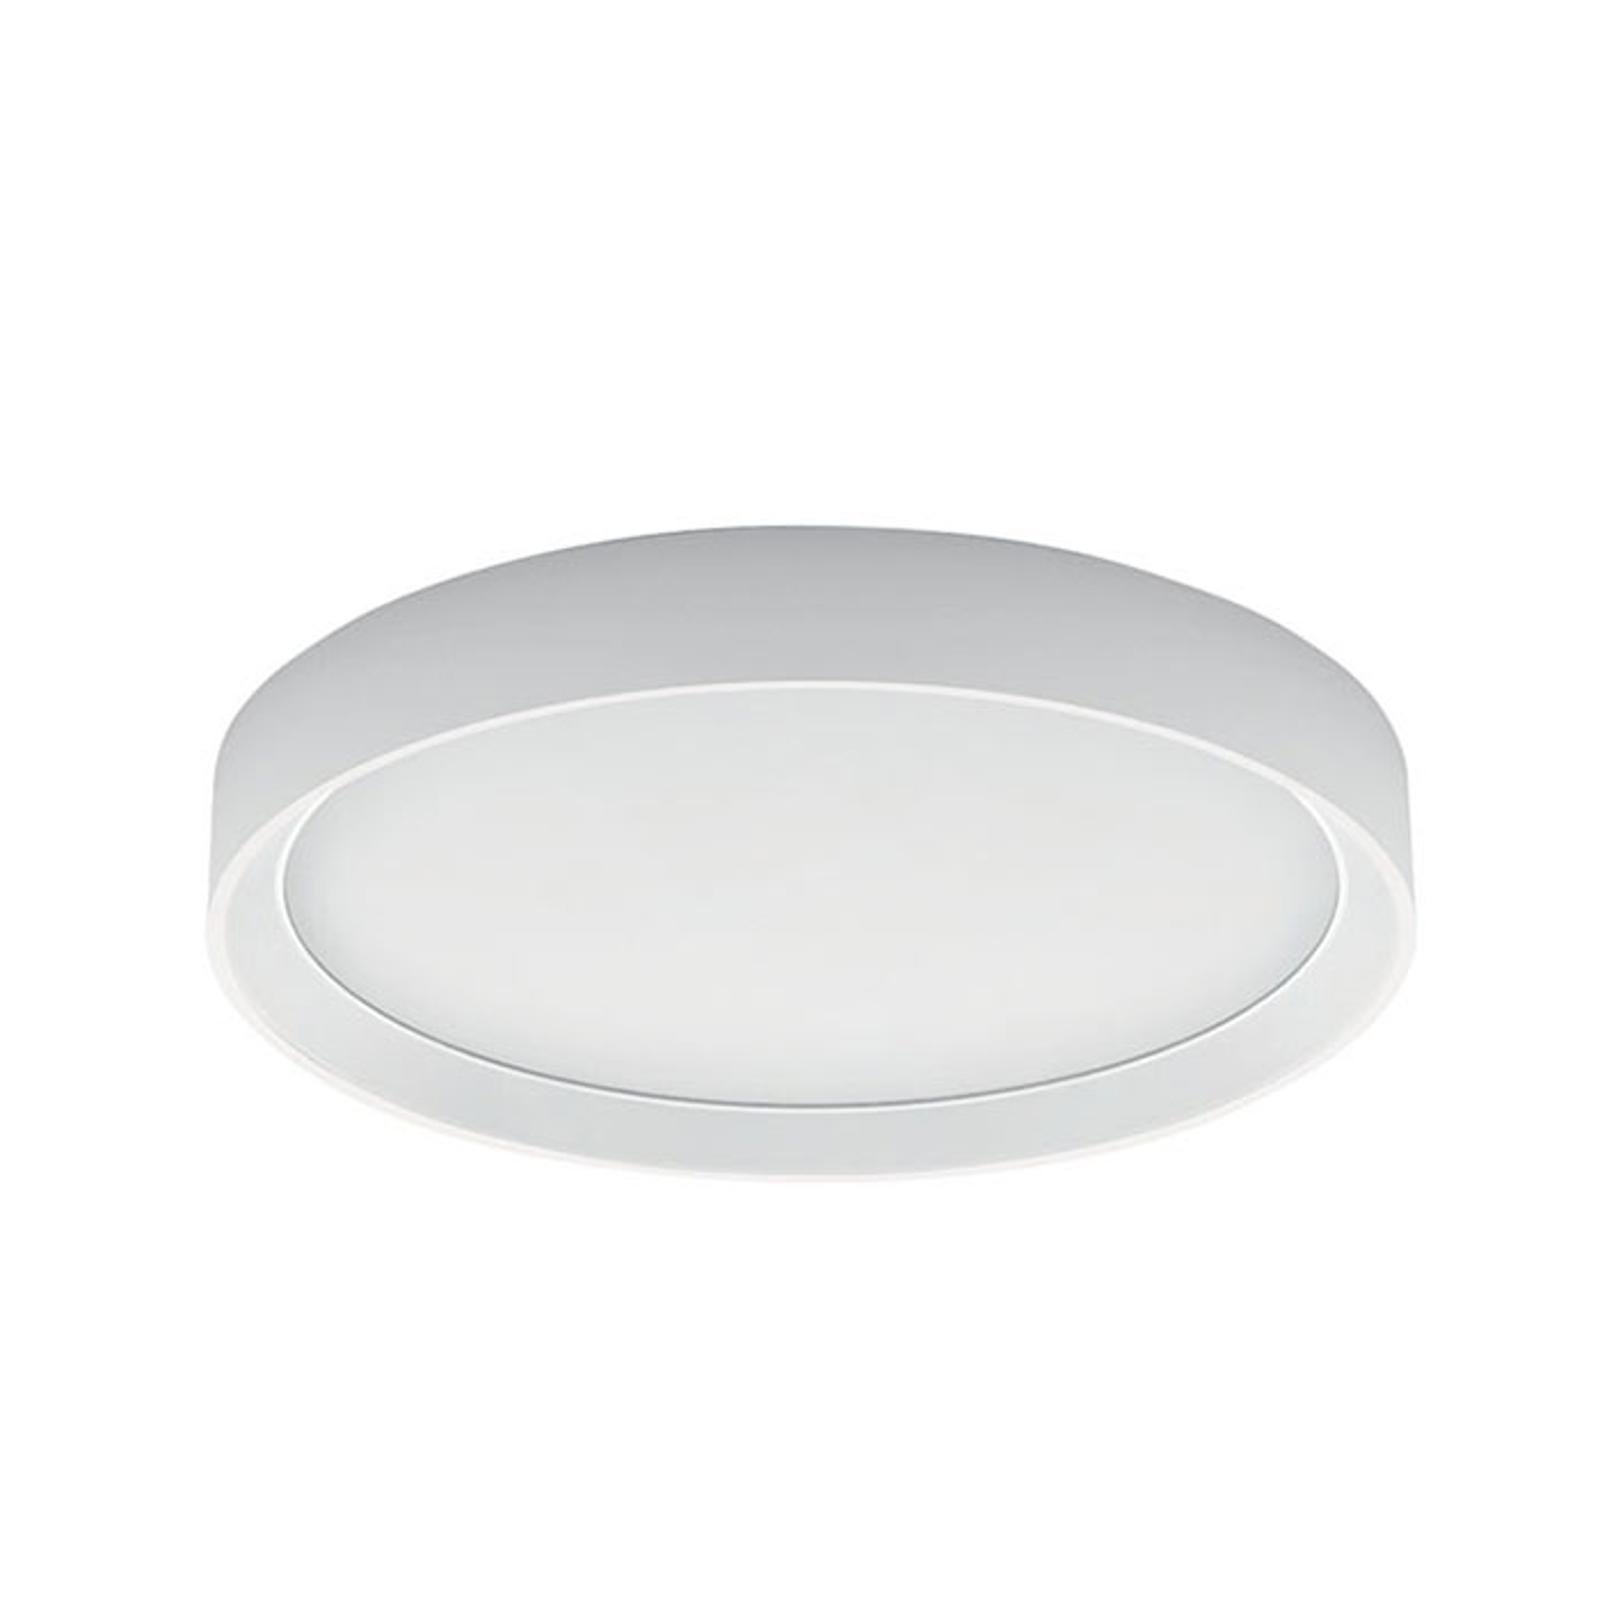 Lampa sufitowa LED Tara R, okrągła, Ø 41 cm